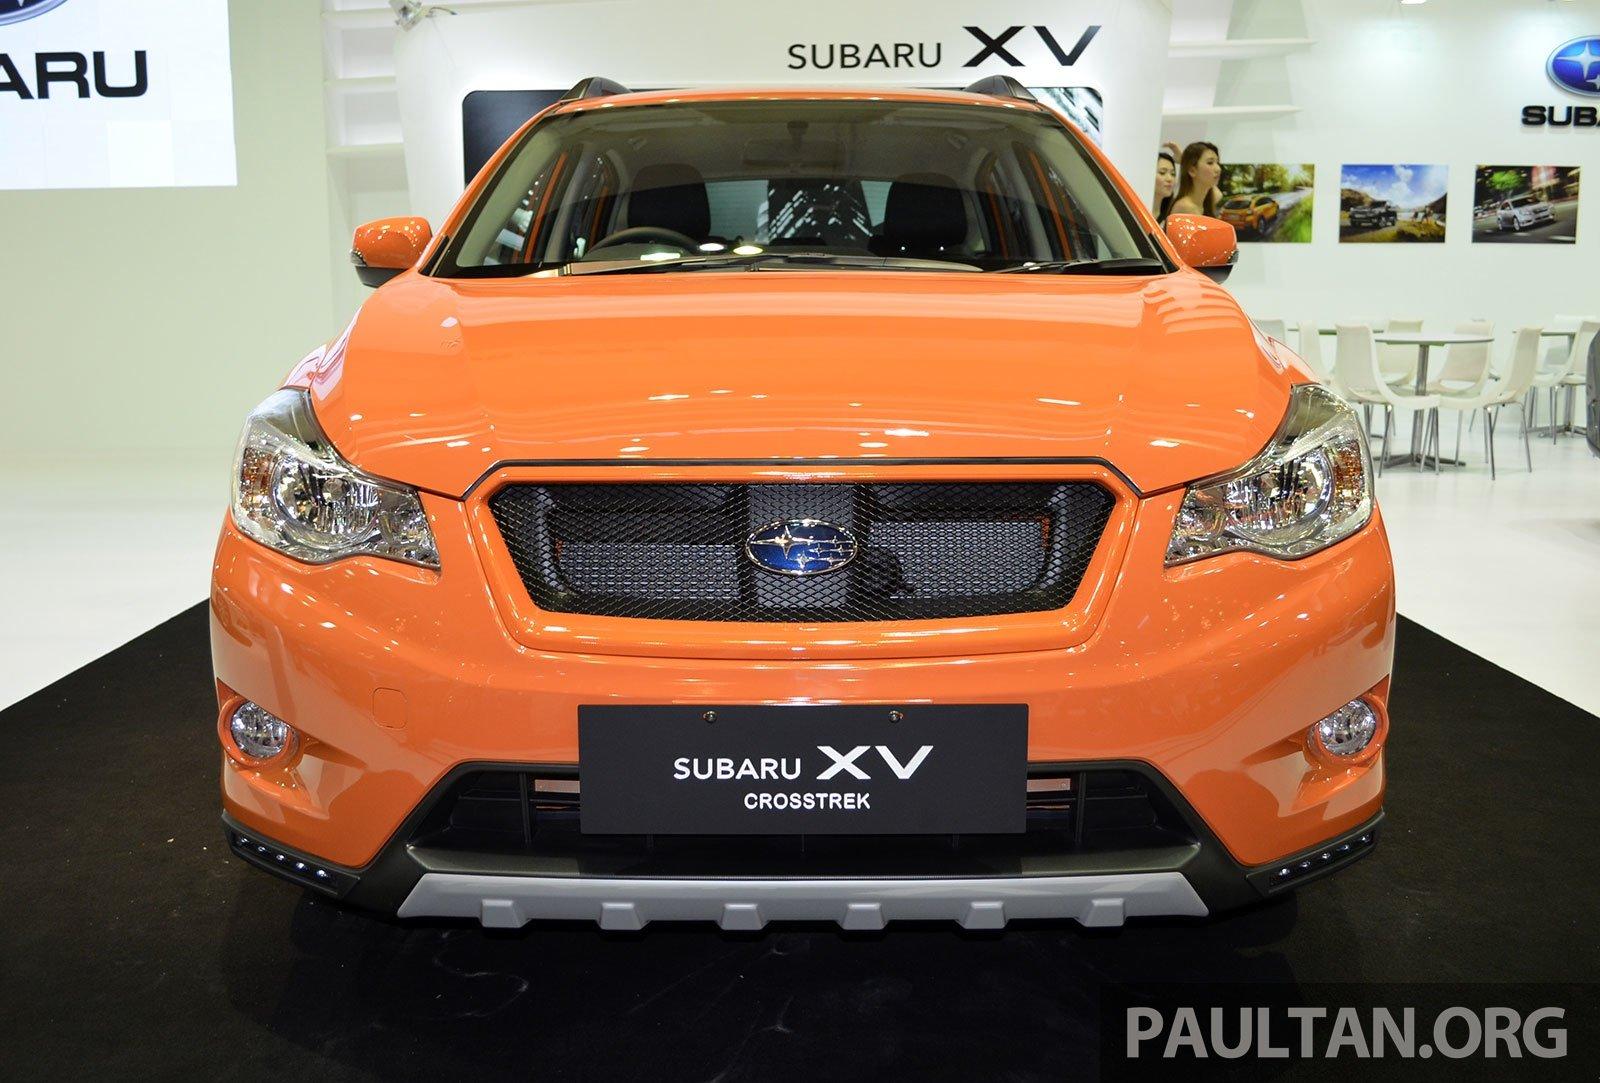 Subaru Xv Crosstrek 55 Unit Limited Edition Rm162k